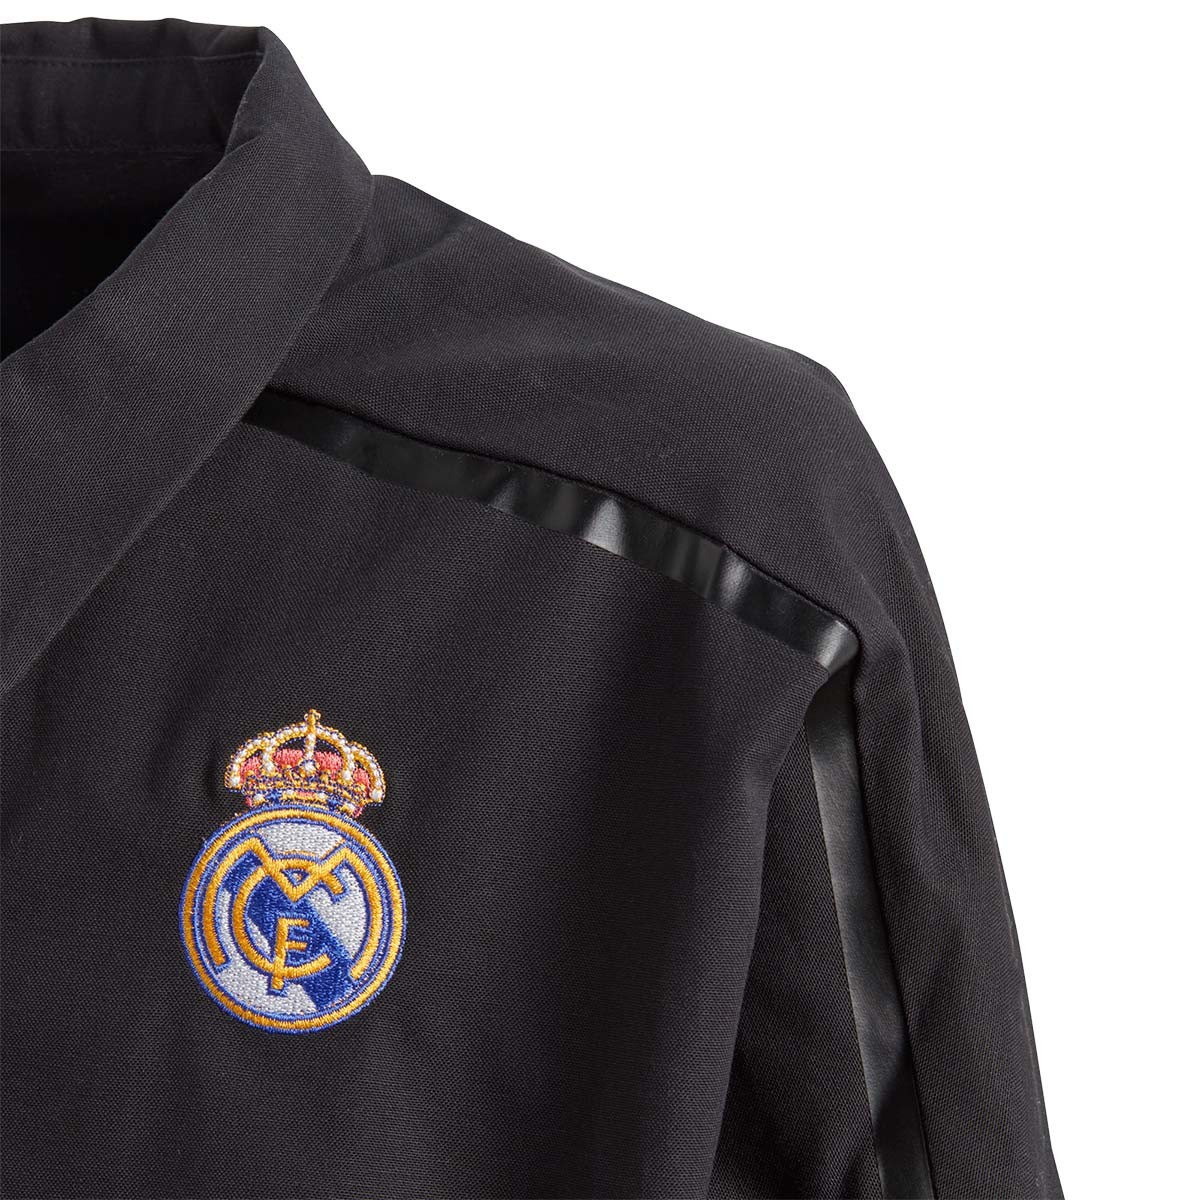 f1c22e978d96a Jacket adidas Kids Real Madrid ZNE JKT WV 2017-2018 Black - Tienda de  fútbol Fútbol Emotion